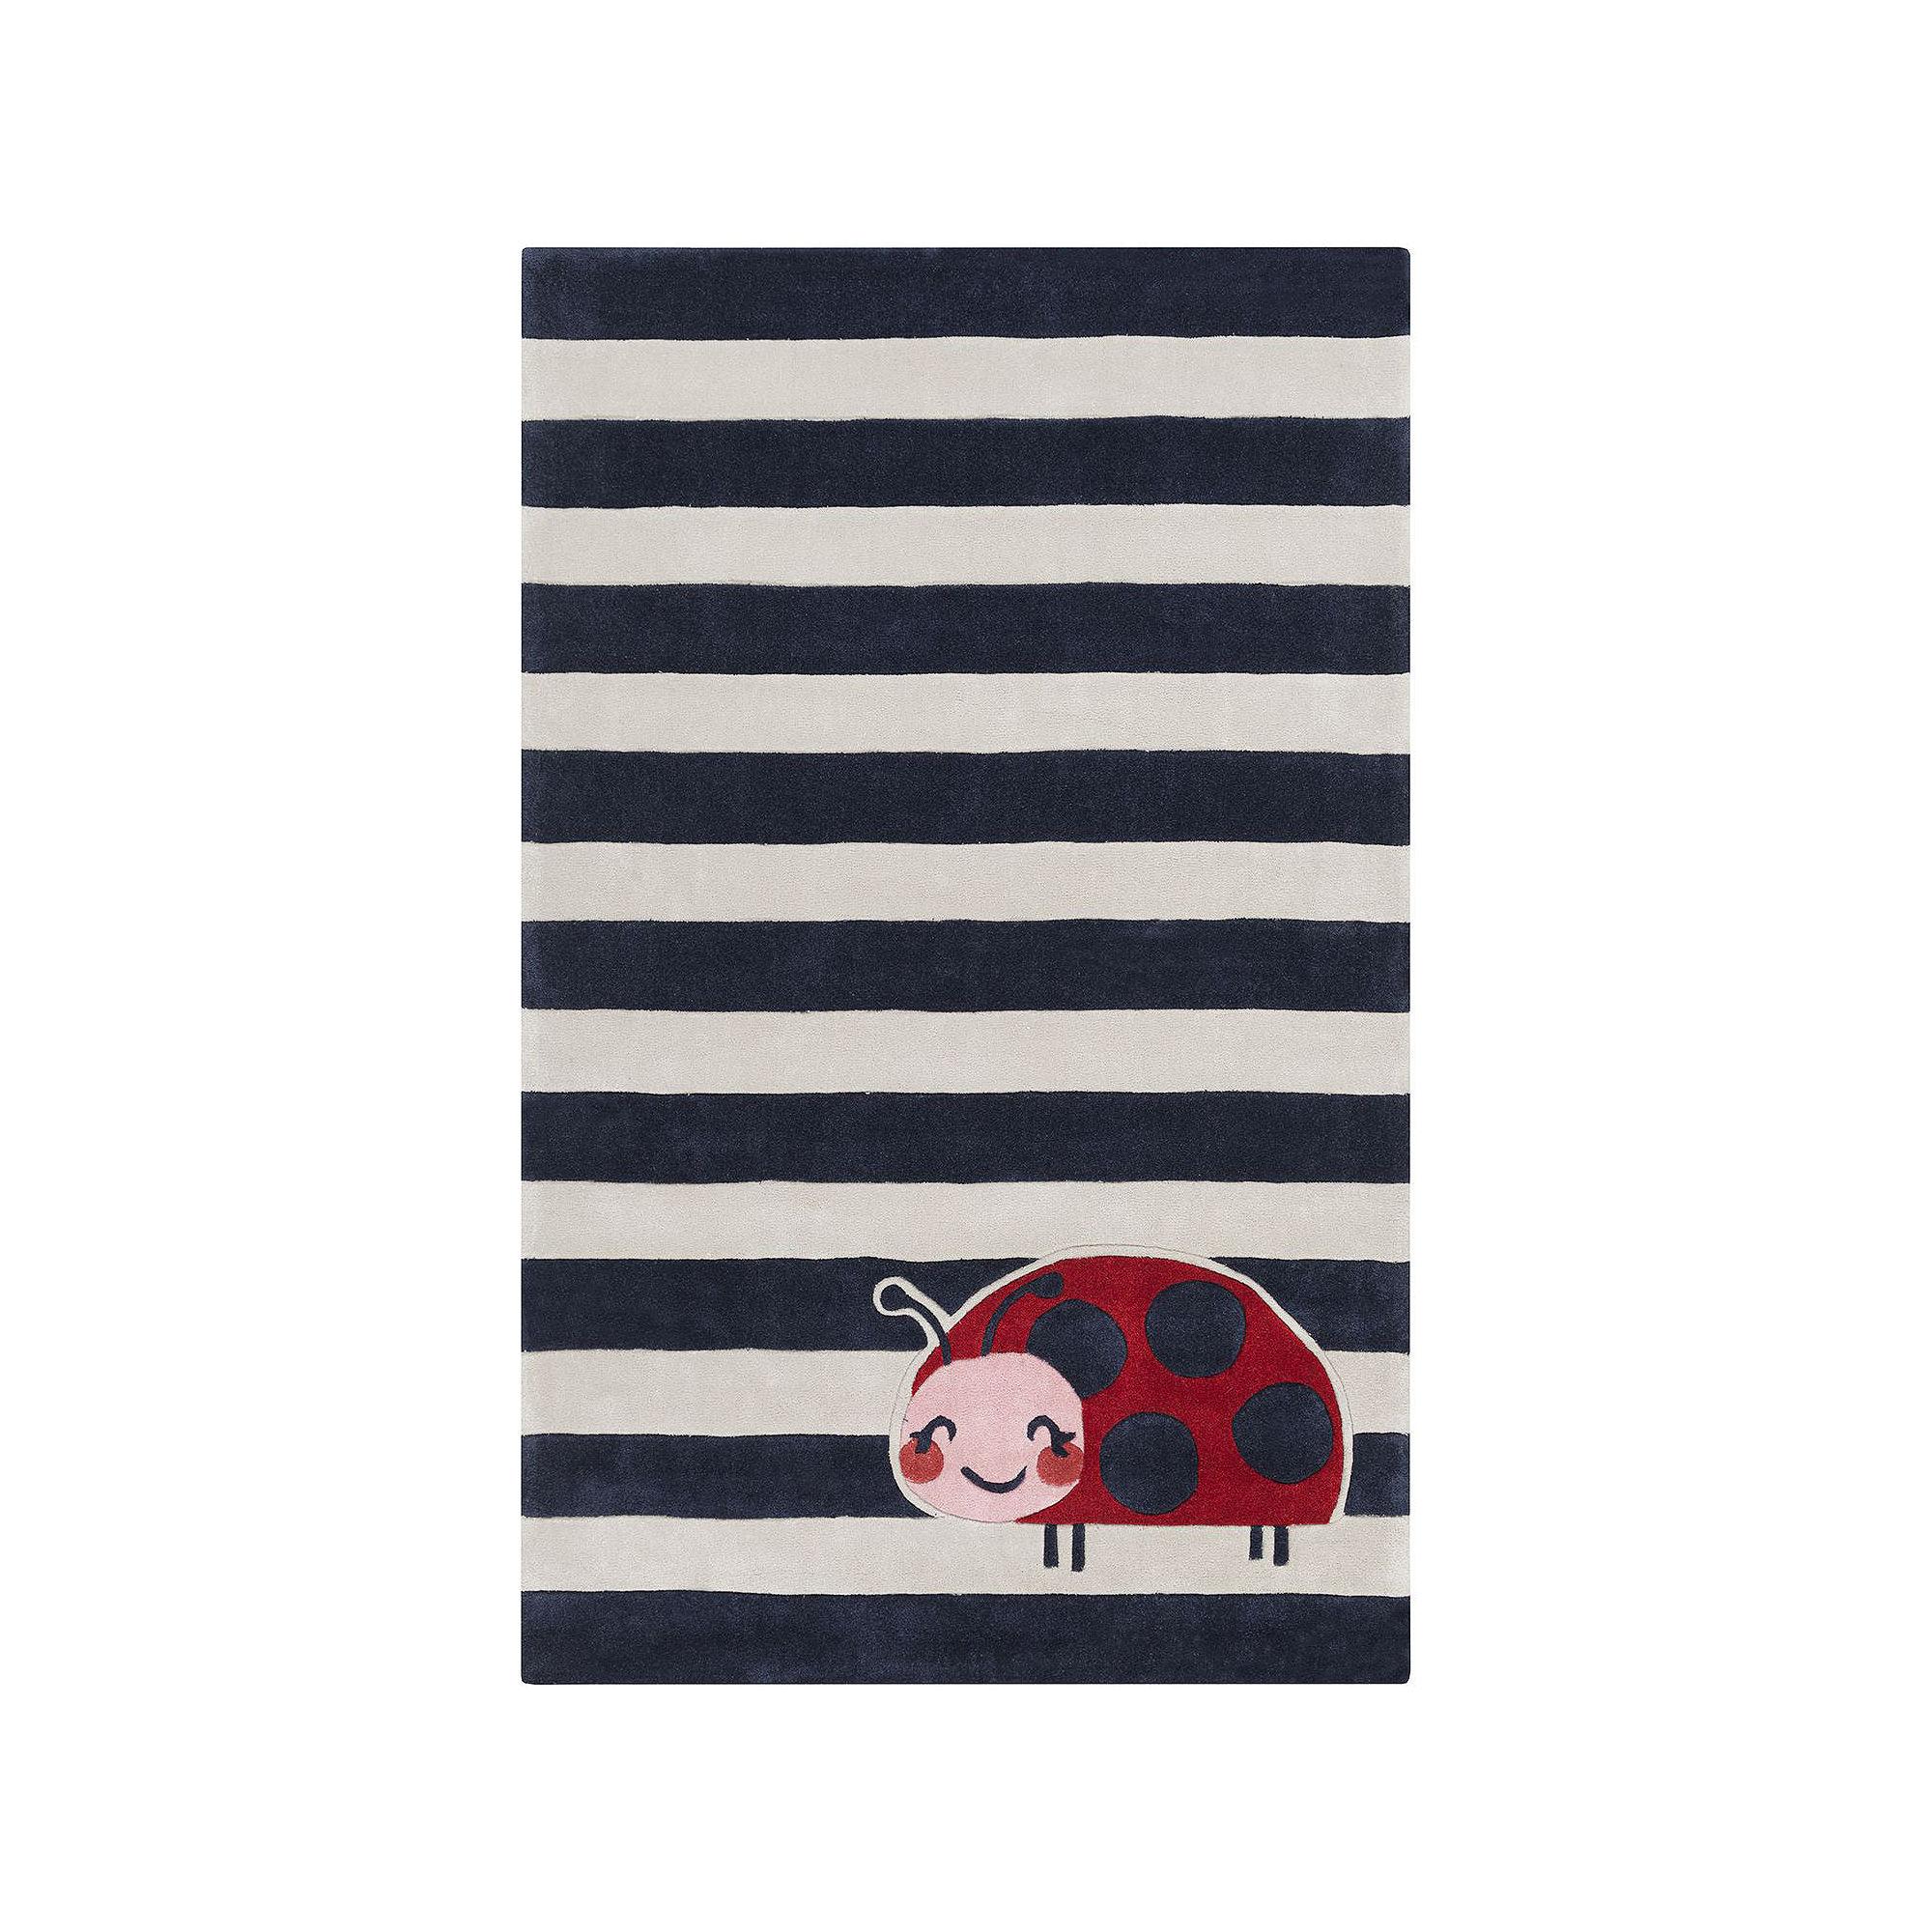 Zoe Hand-Tufted Rectangular Rug